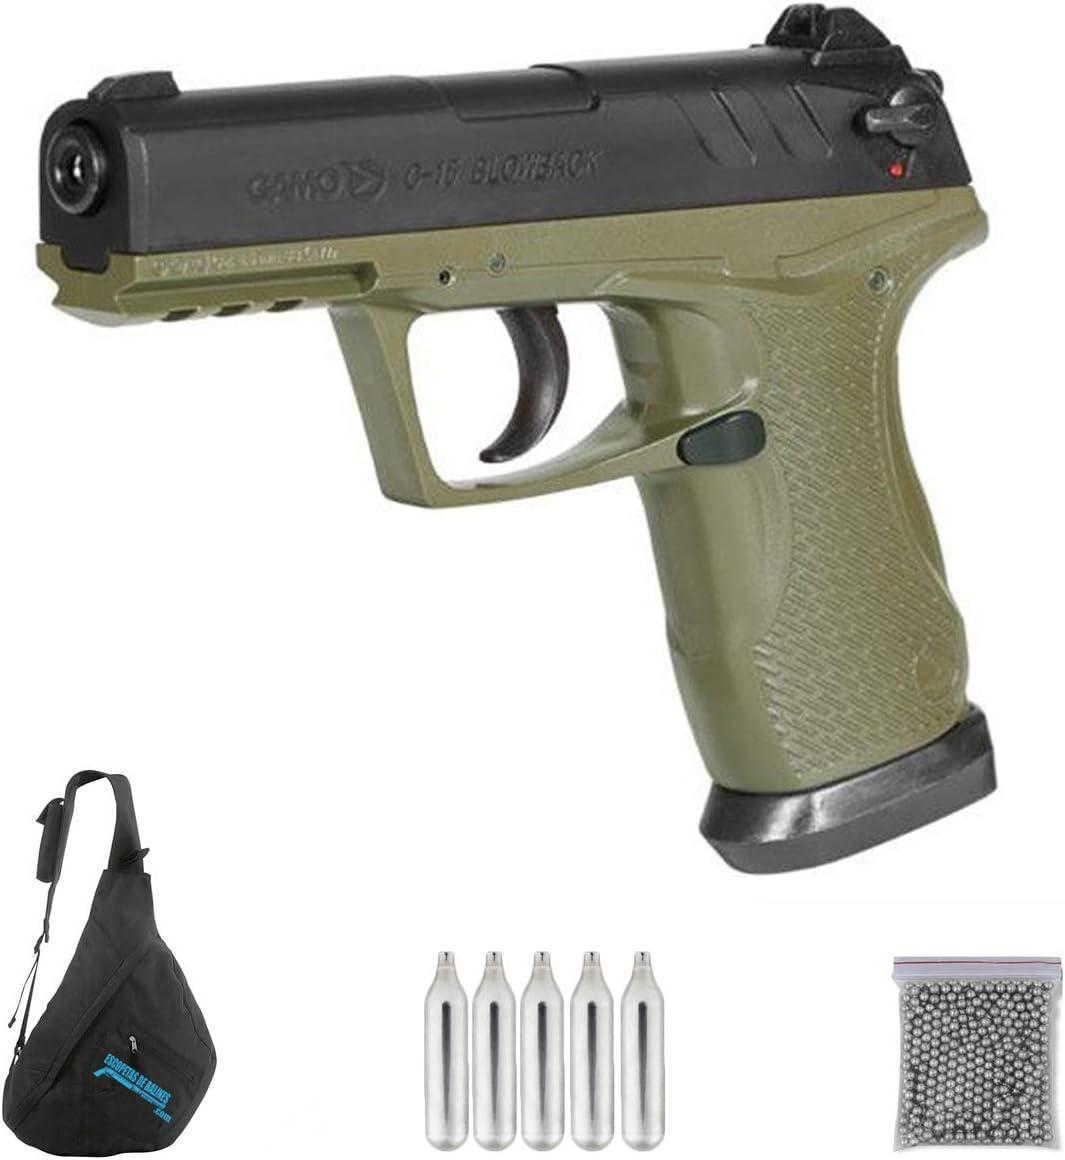 Gamo C-15 Blowback Olive Drab | Pack Pistola de balines (perdigones o Bolas de Acero BB's). Arma de Aire comprimido.CO2. Calibre 4,5mm. 3,33 Julios.